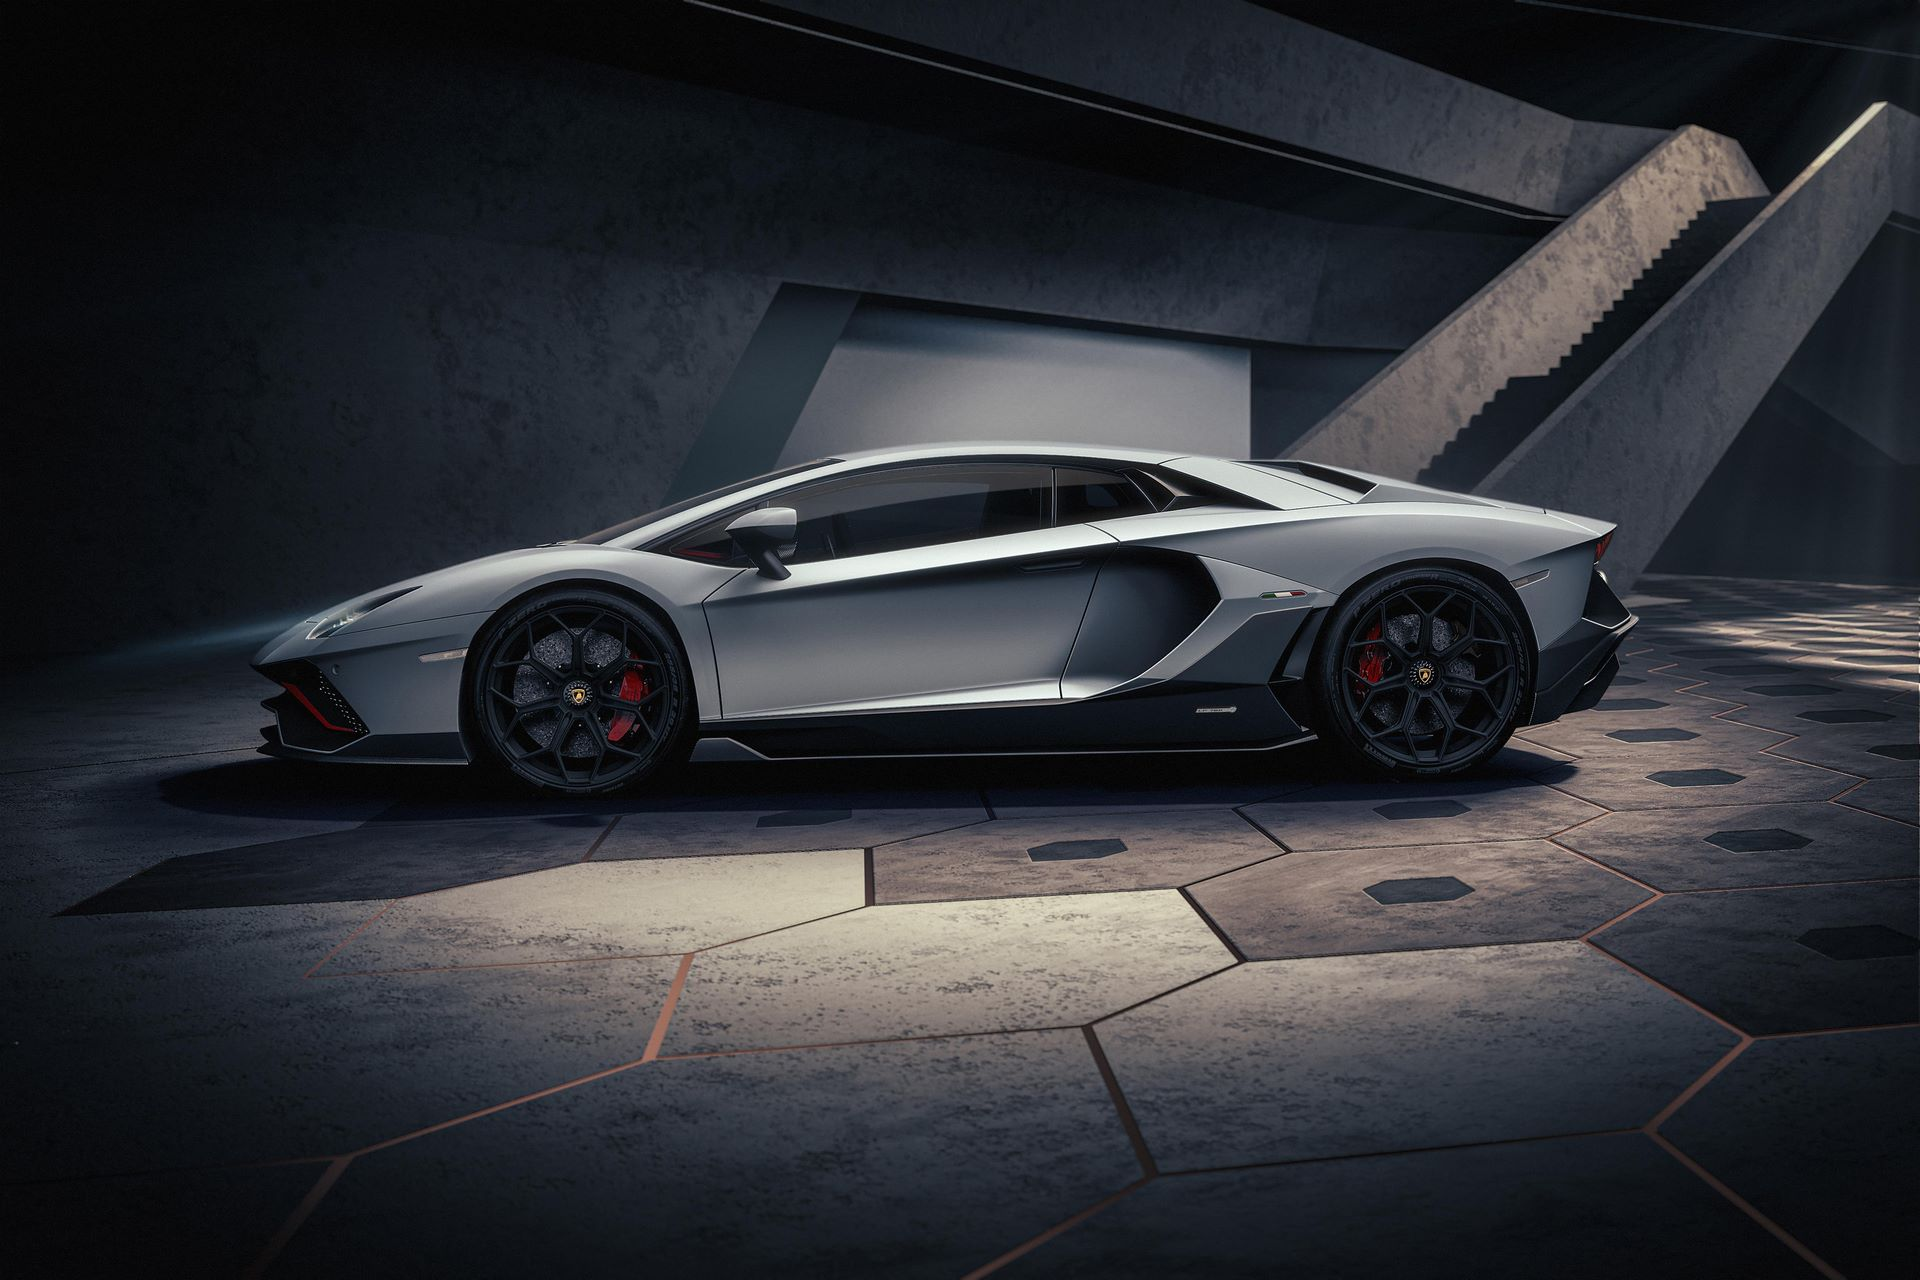 Lamborghini-Aventador-LP780-4-Ultimae-11